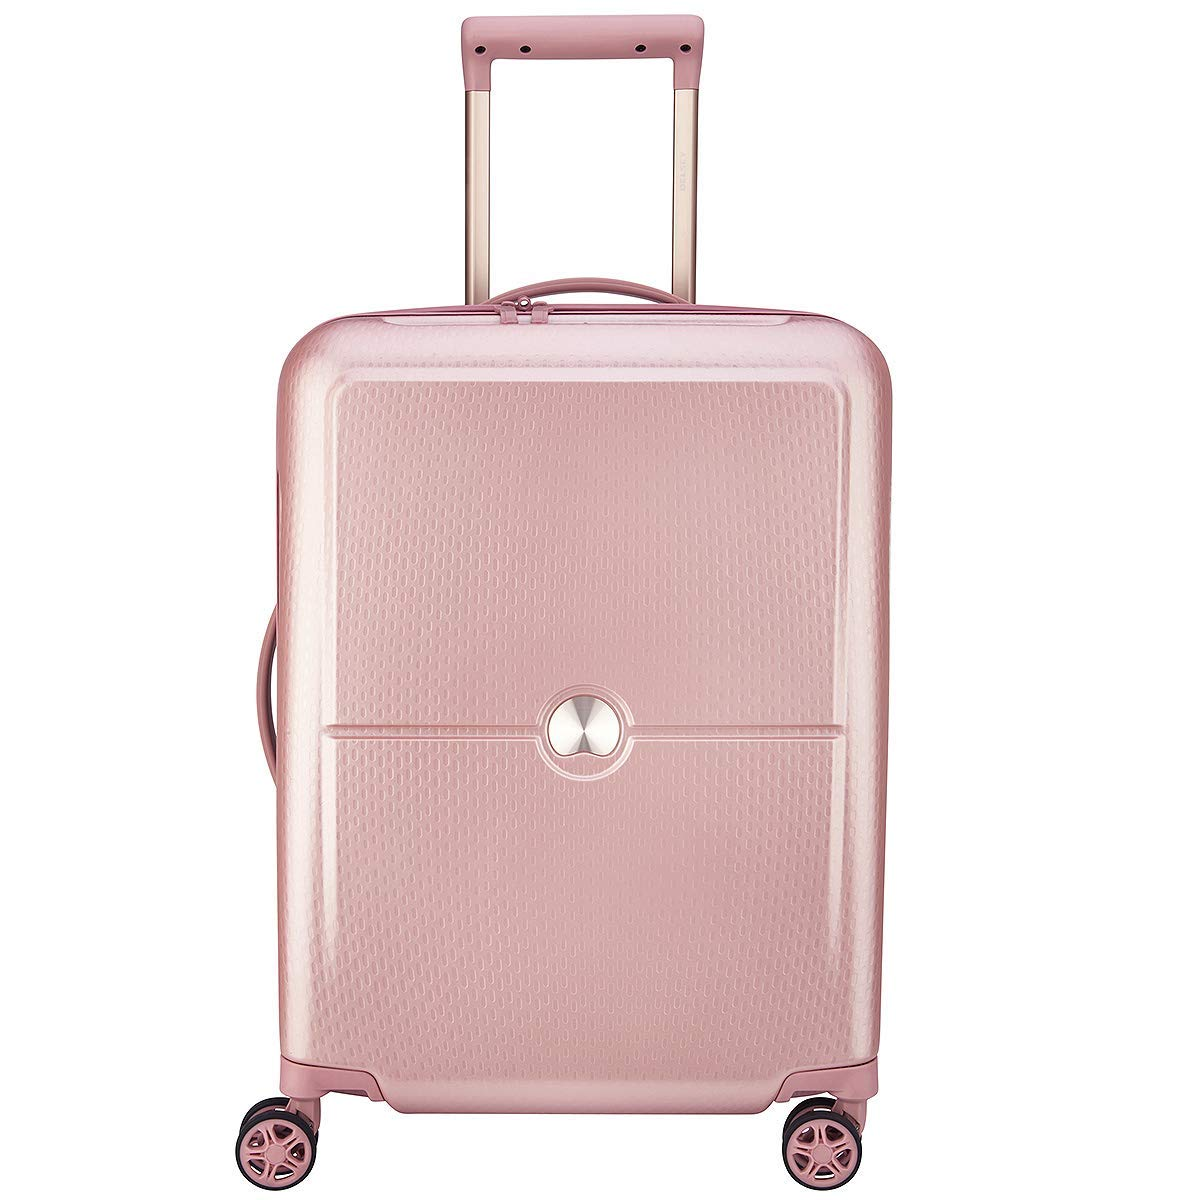 handgepaeck-koffer-rosa